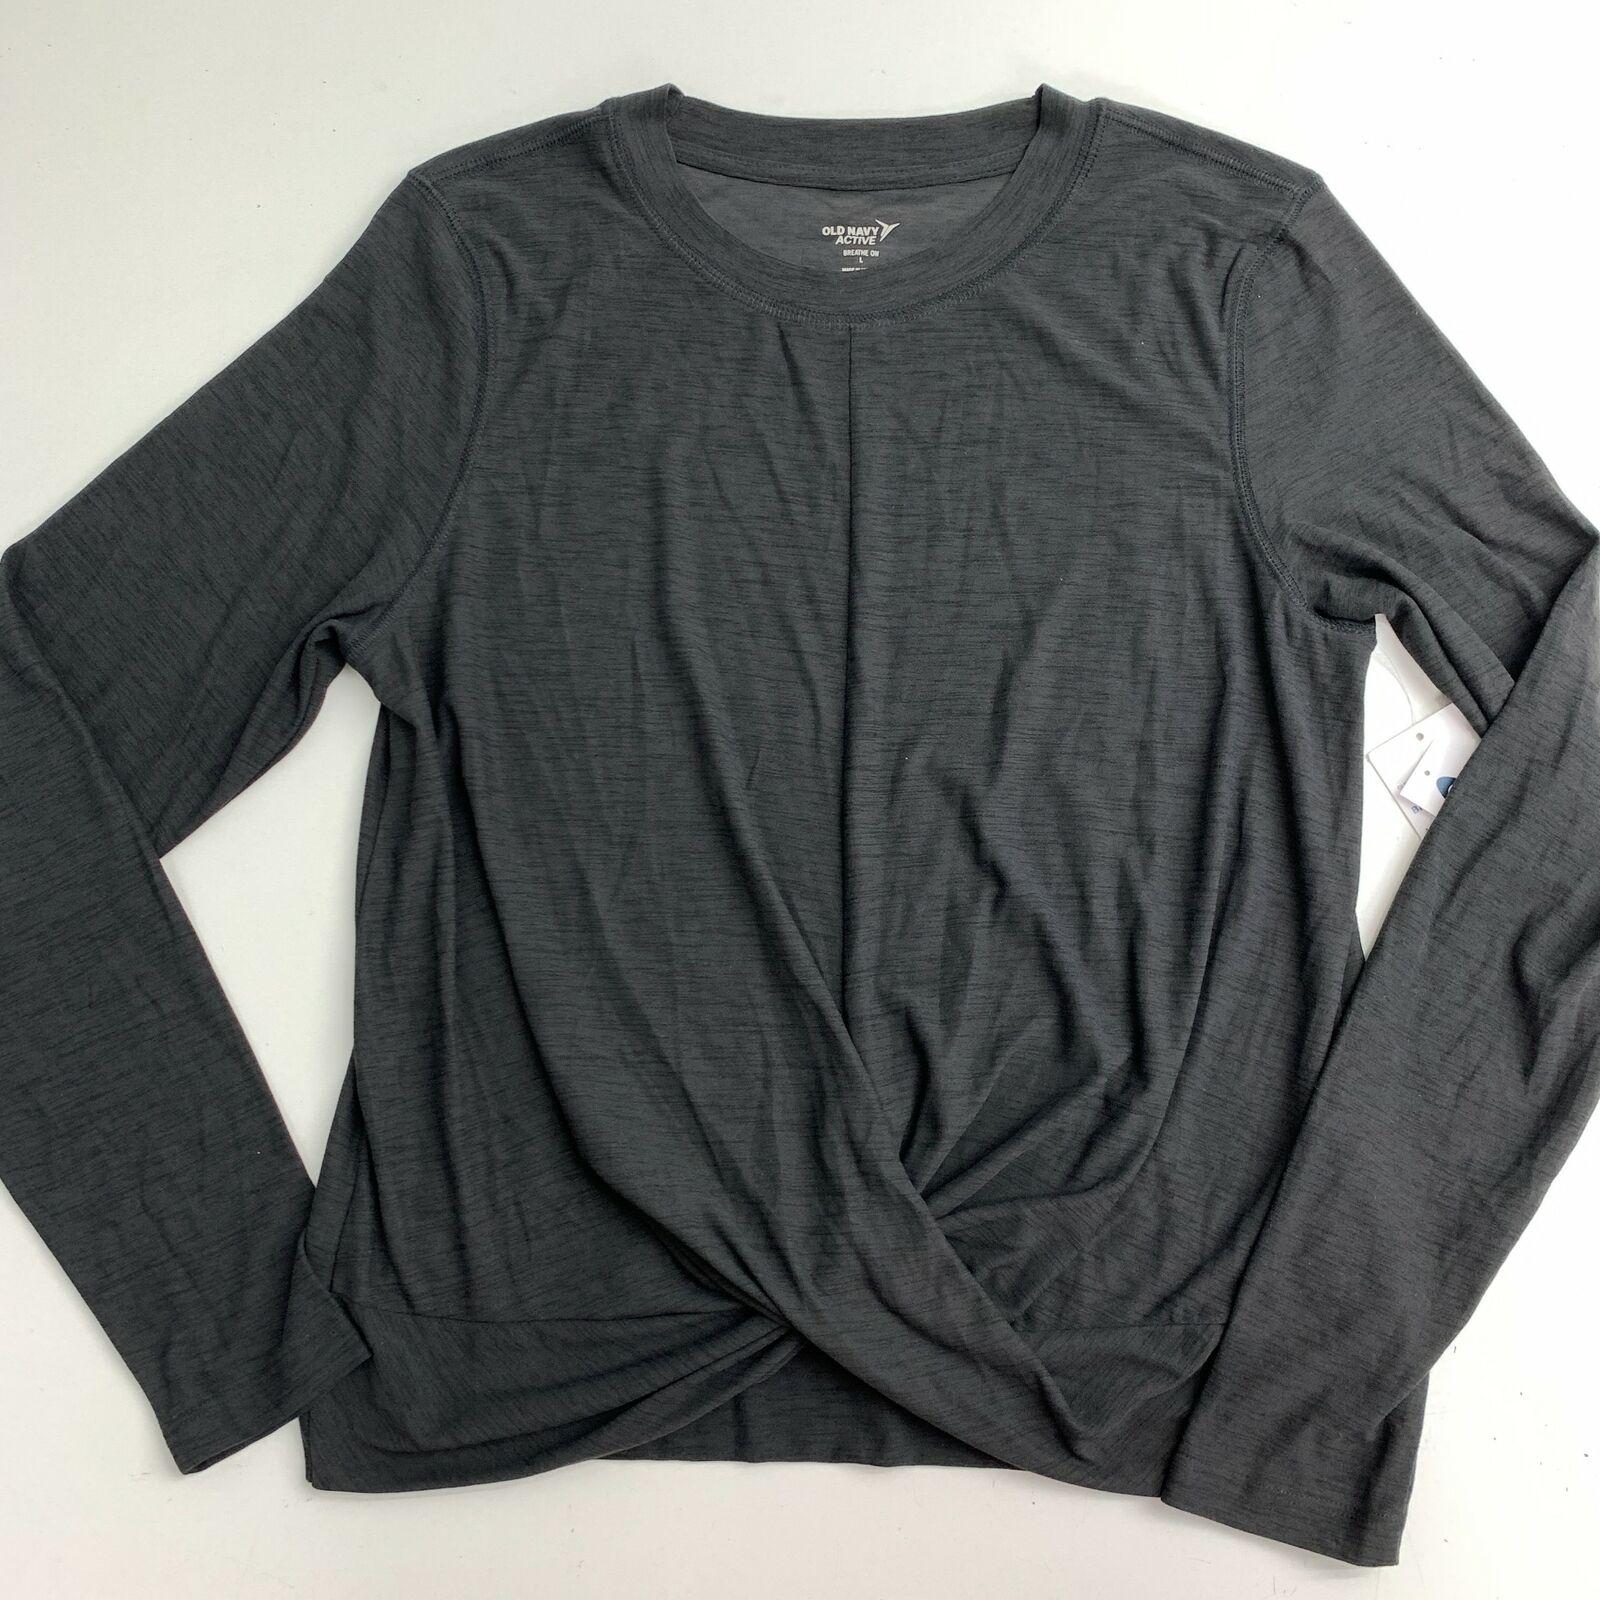 NWT Old Navy Yoga T-Shirt Top Women's L Gray Draped Hem Long Sleeve Gym Workout